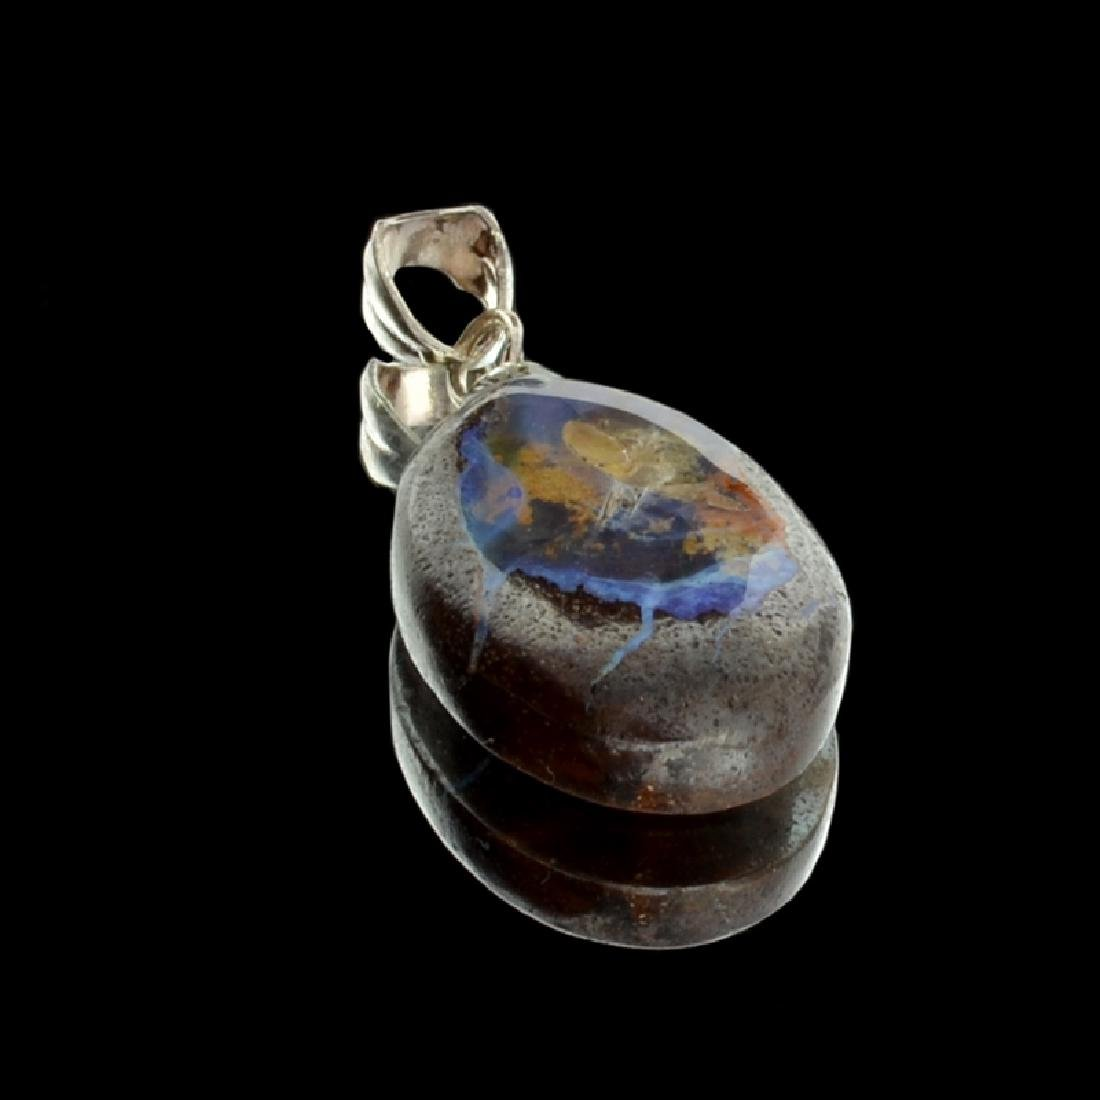 7.75CT Boulder Opal Sterling Silver Pendant